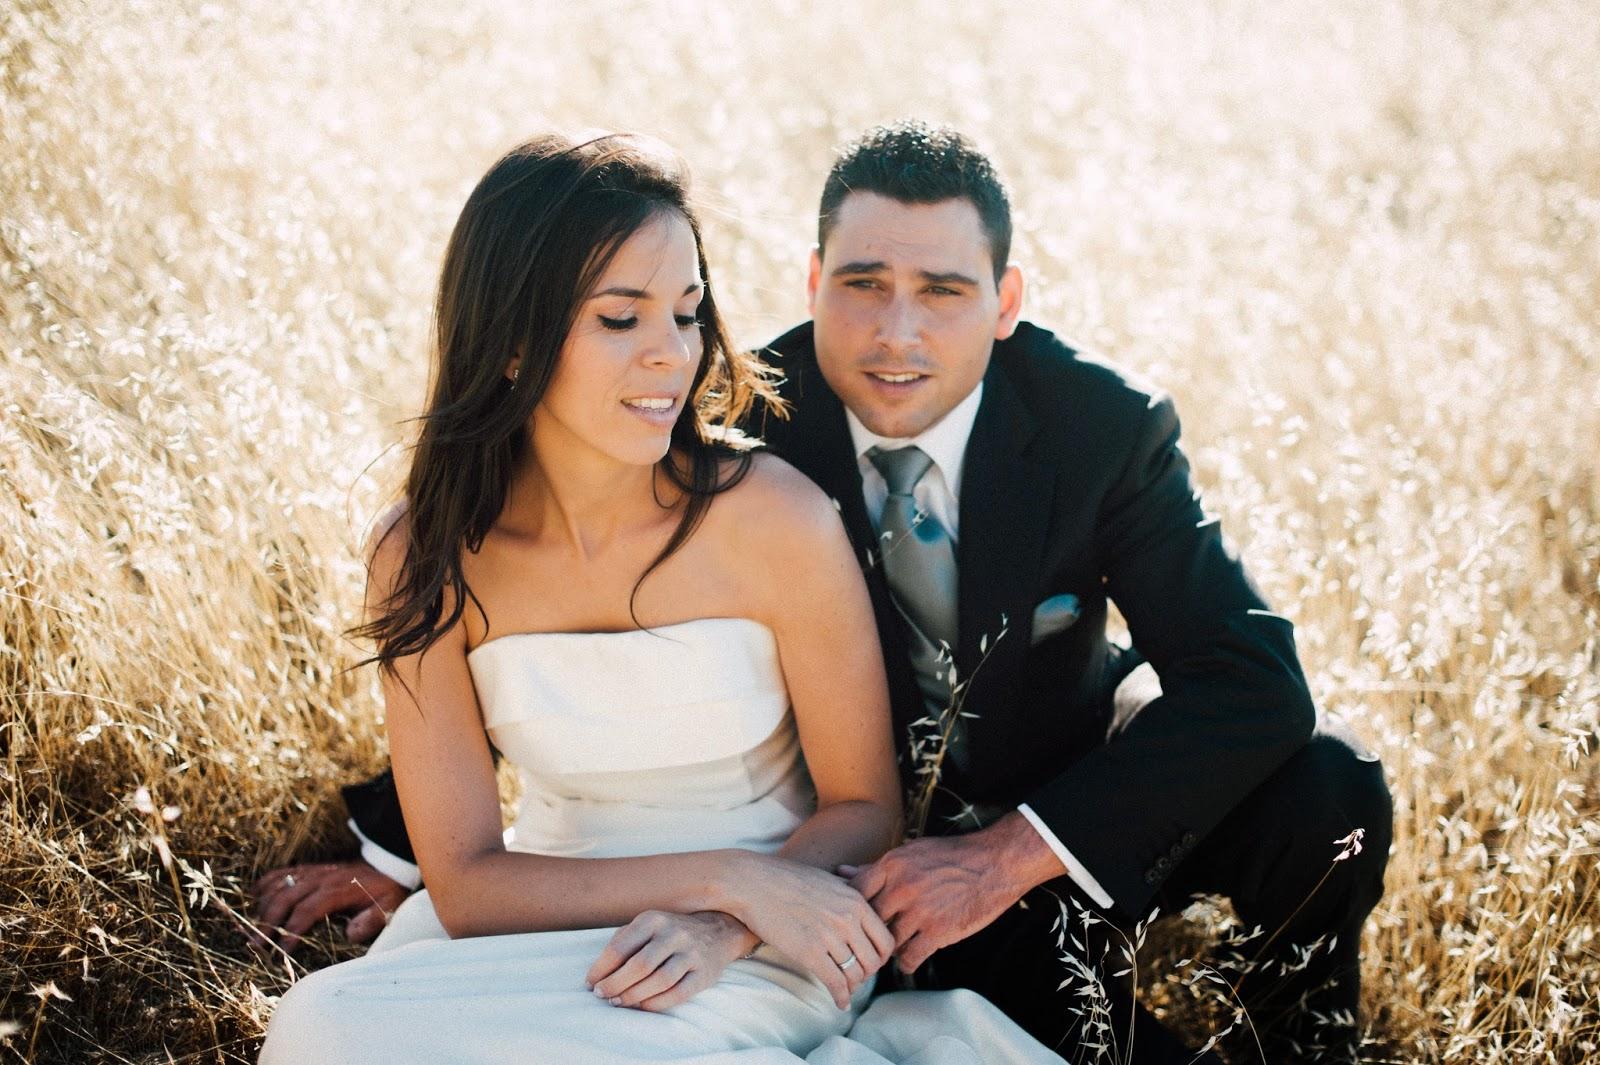 Aljosa petric fotografo de boda las palmas gran canaria - Fotografo gran canaria ...